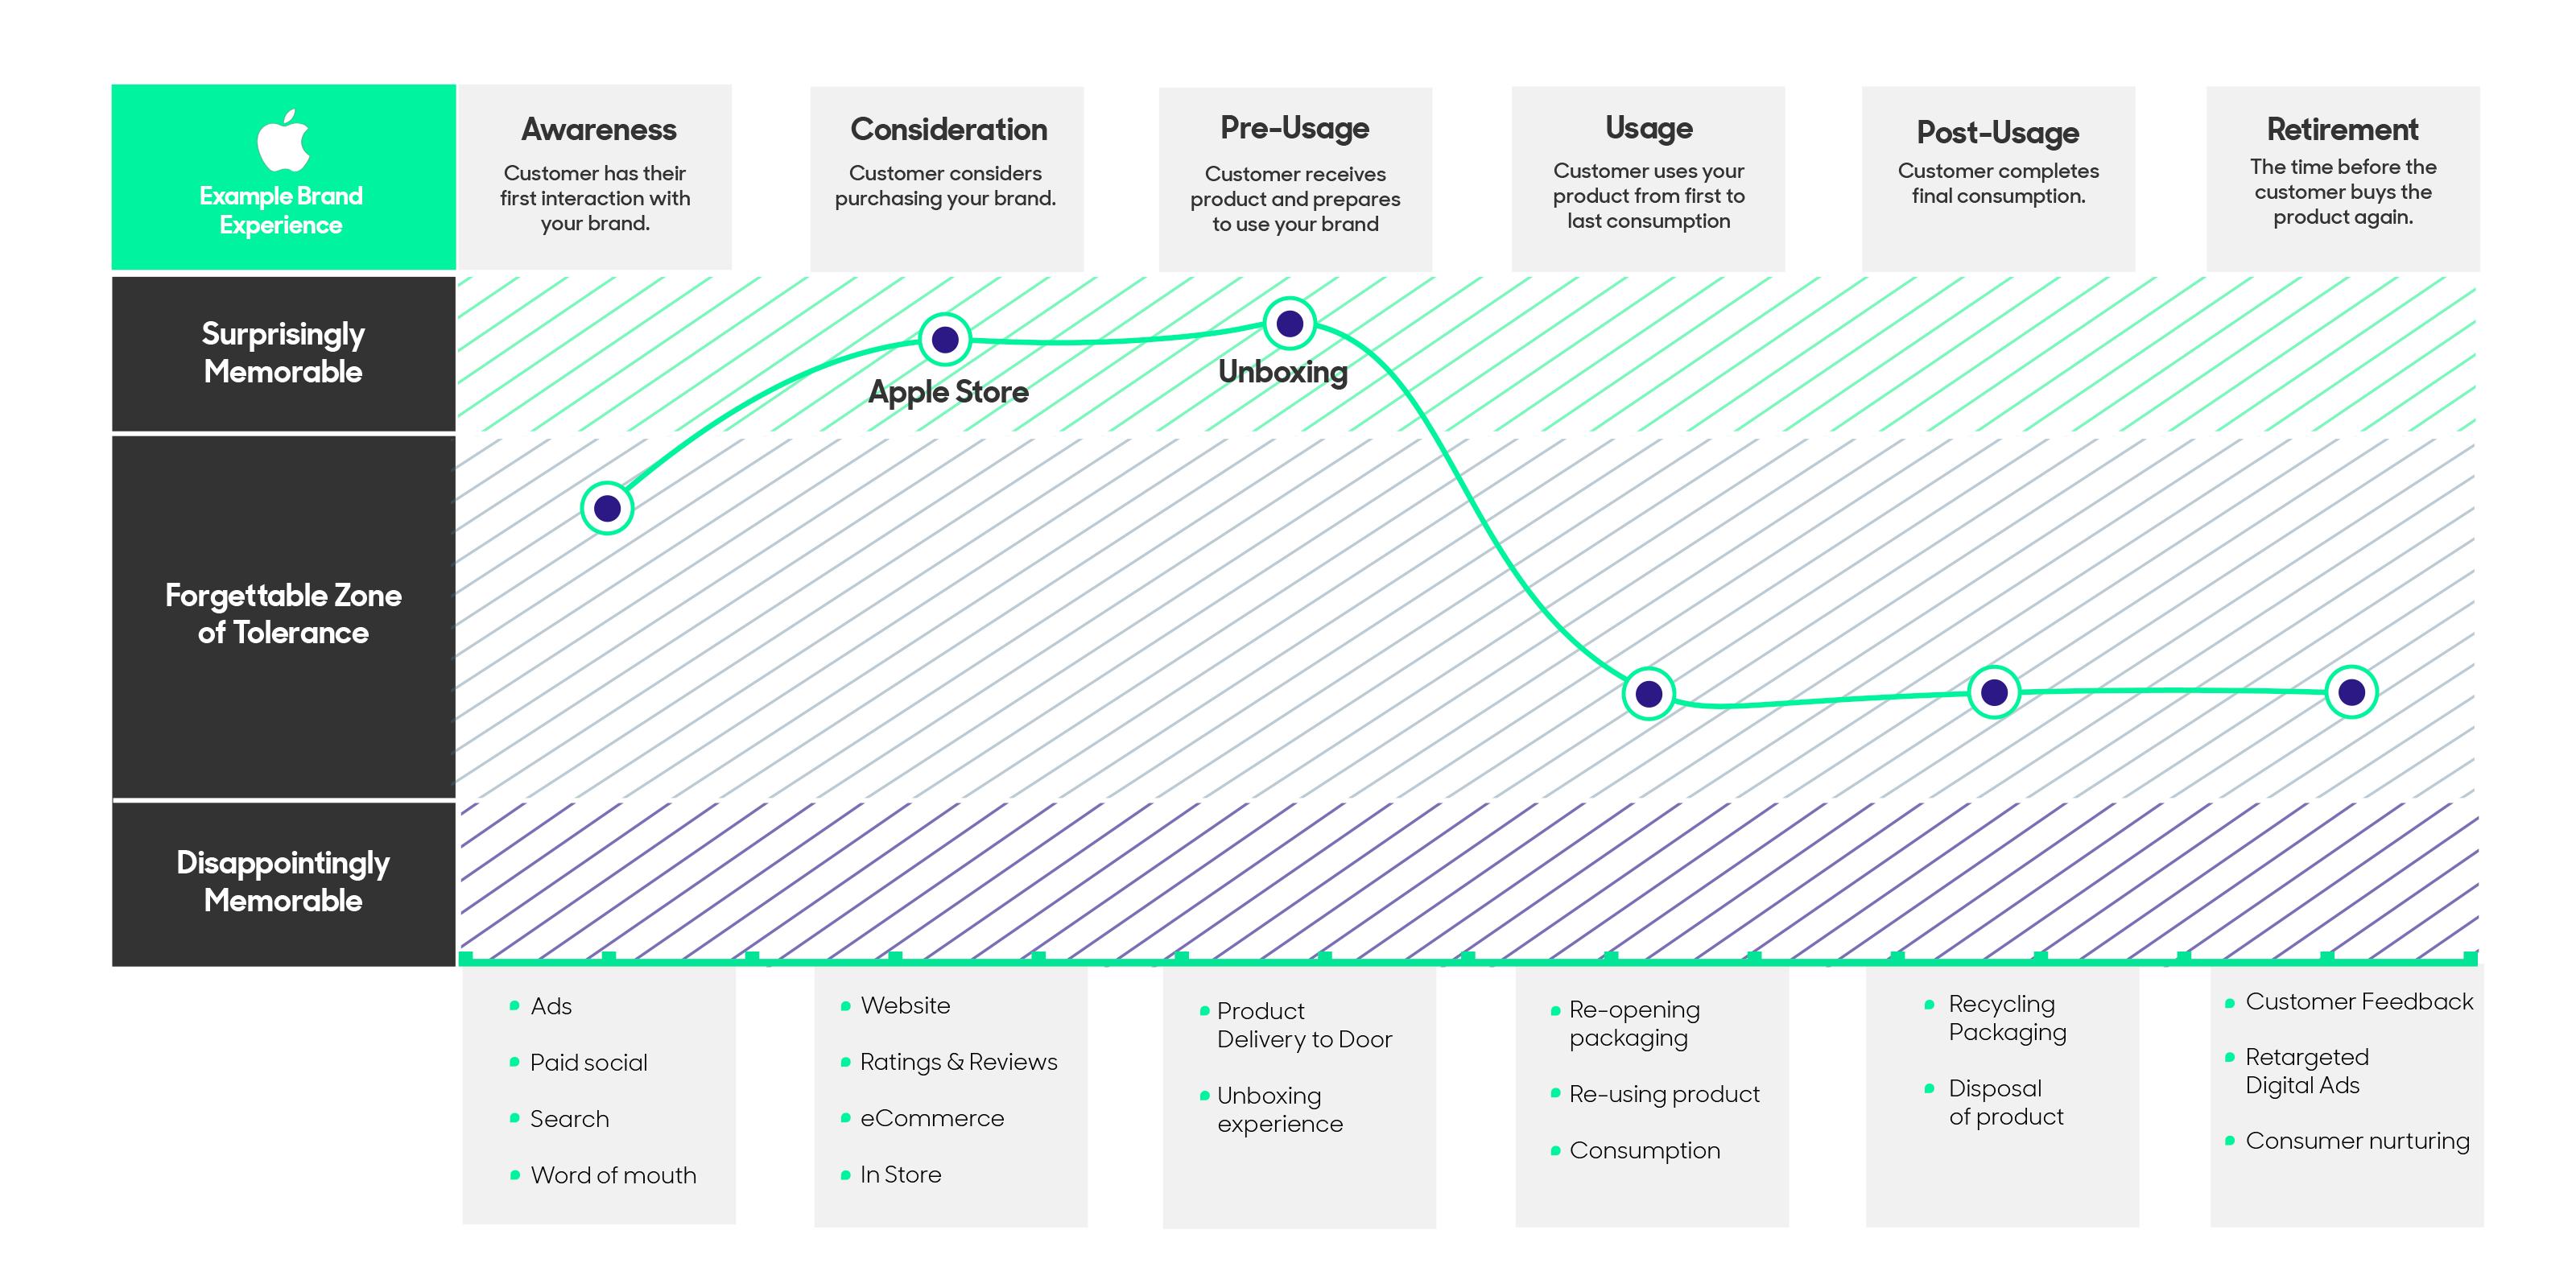 Apple consumer experience